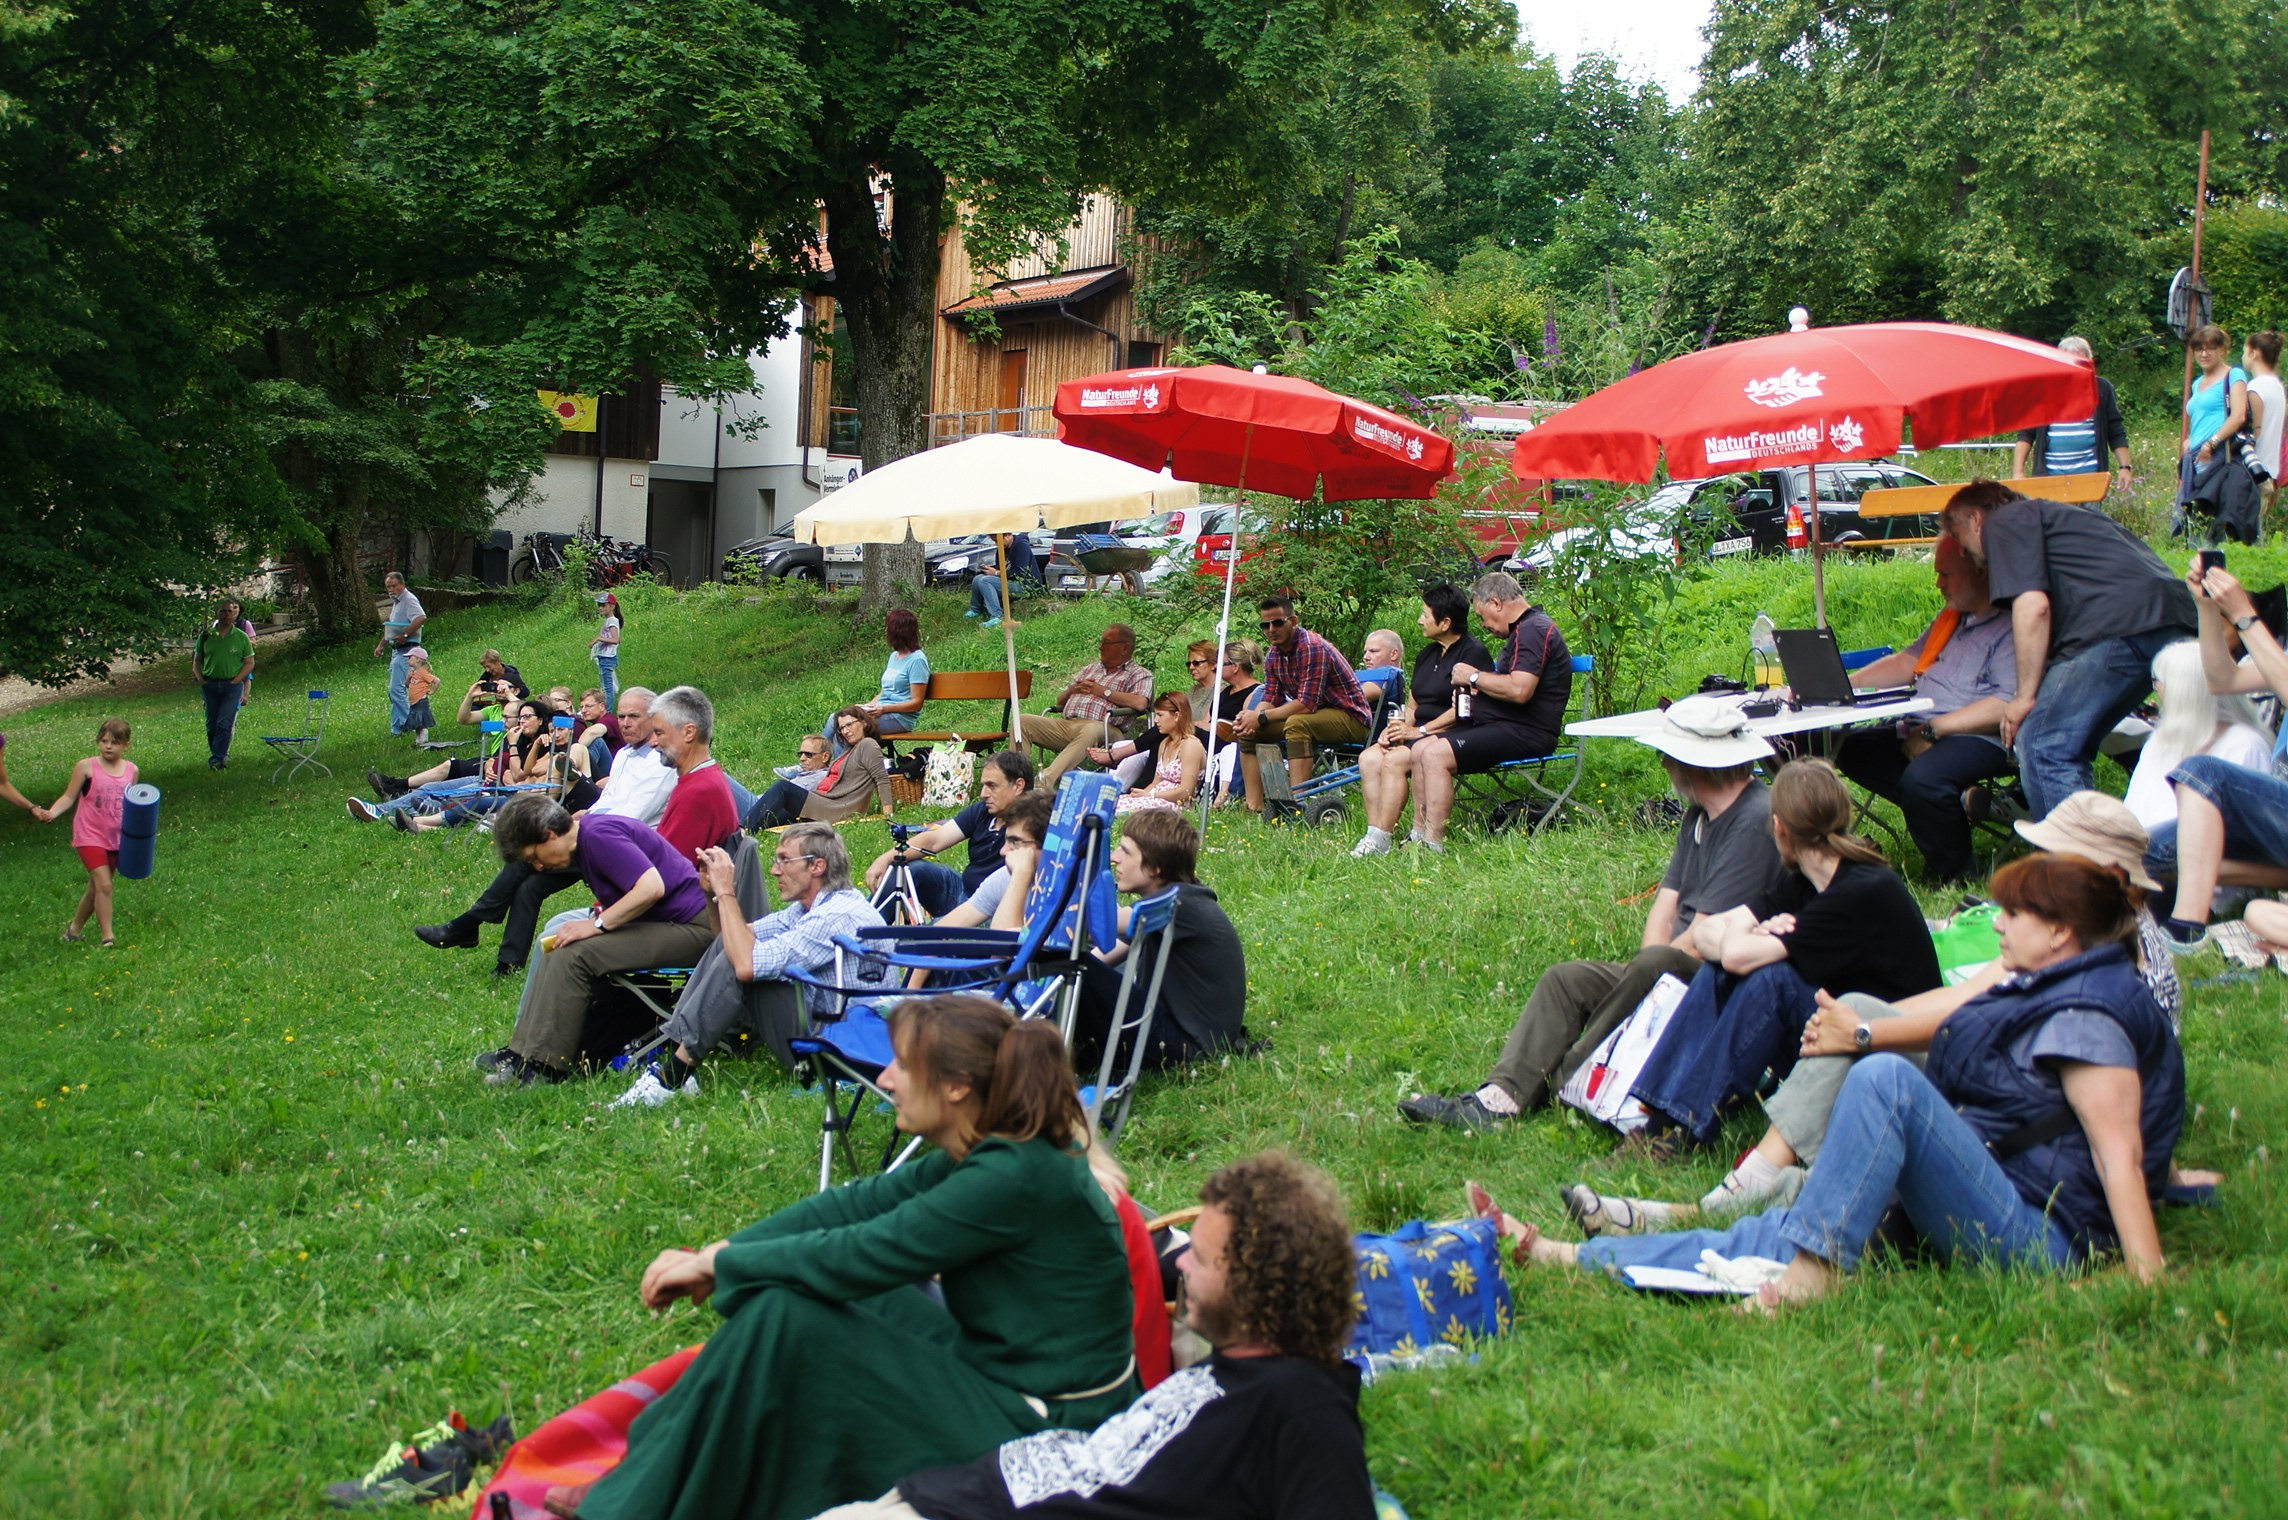 29 2016_08 Sommerfest Liederfest kleinj.jpg